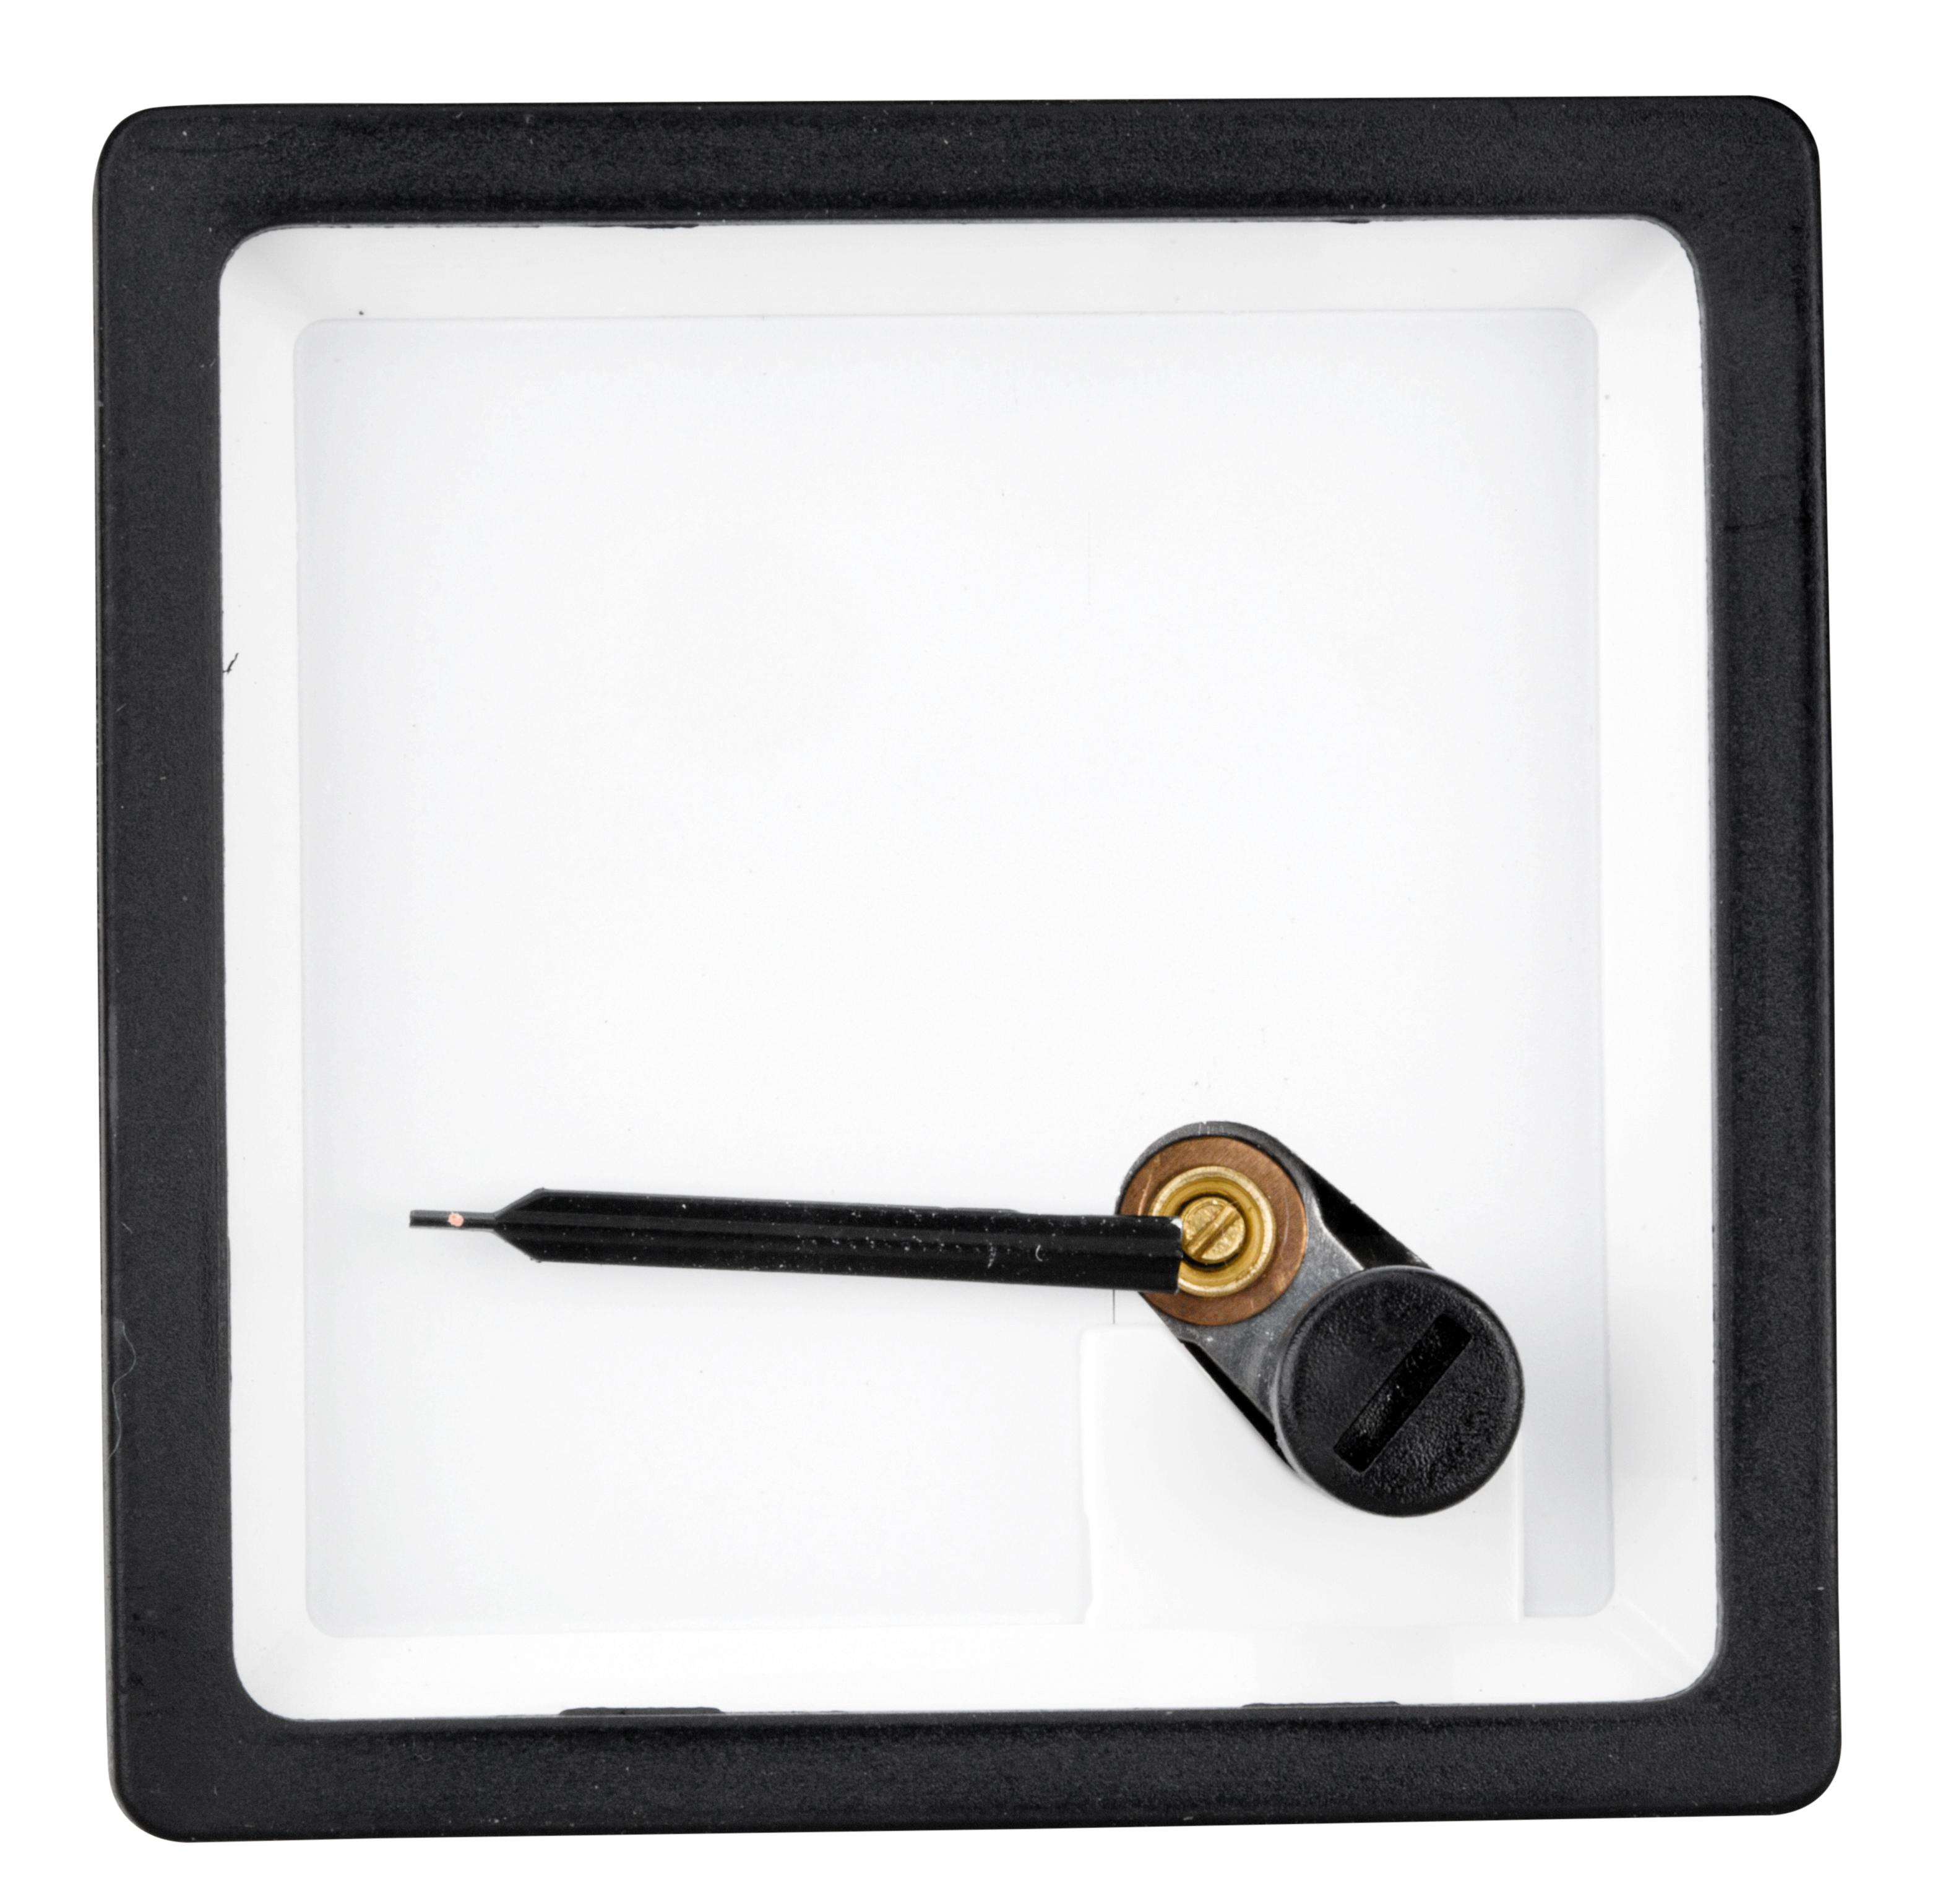 1 Stk Amperemeter, 72x72mm, für Wandlermessung (5A-Wandler) MGF57000-A